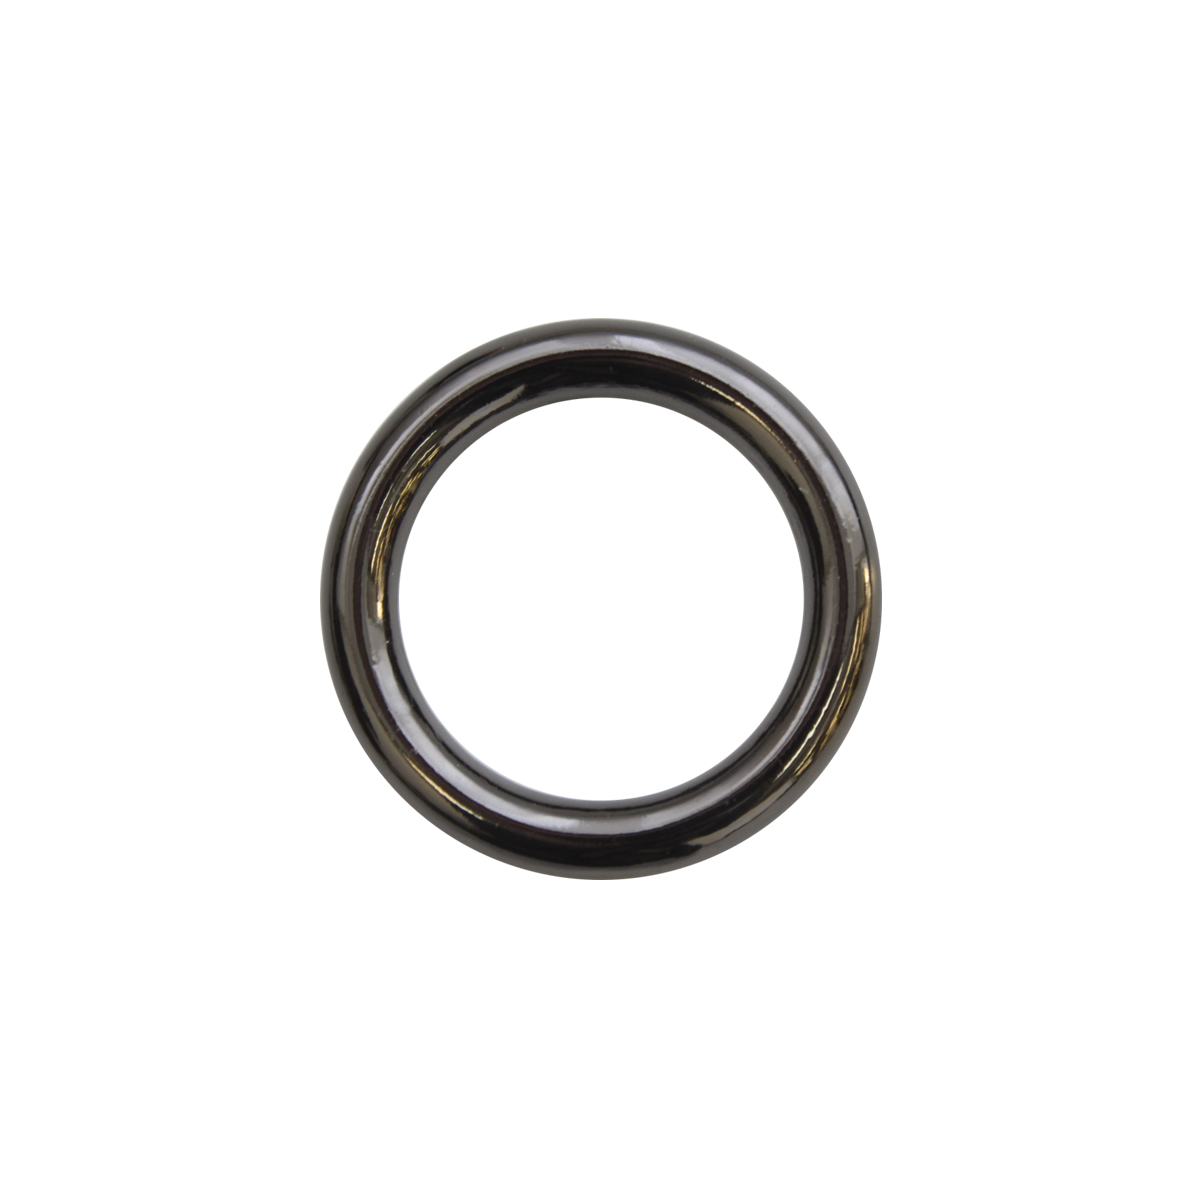 Кольцо литое 819-423, d=25*5мм